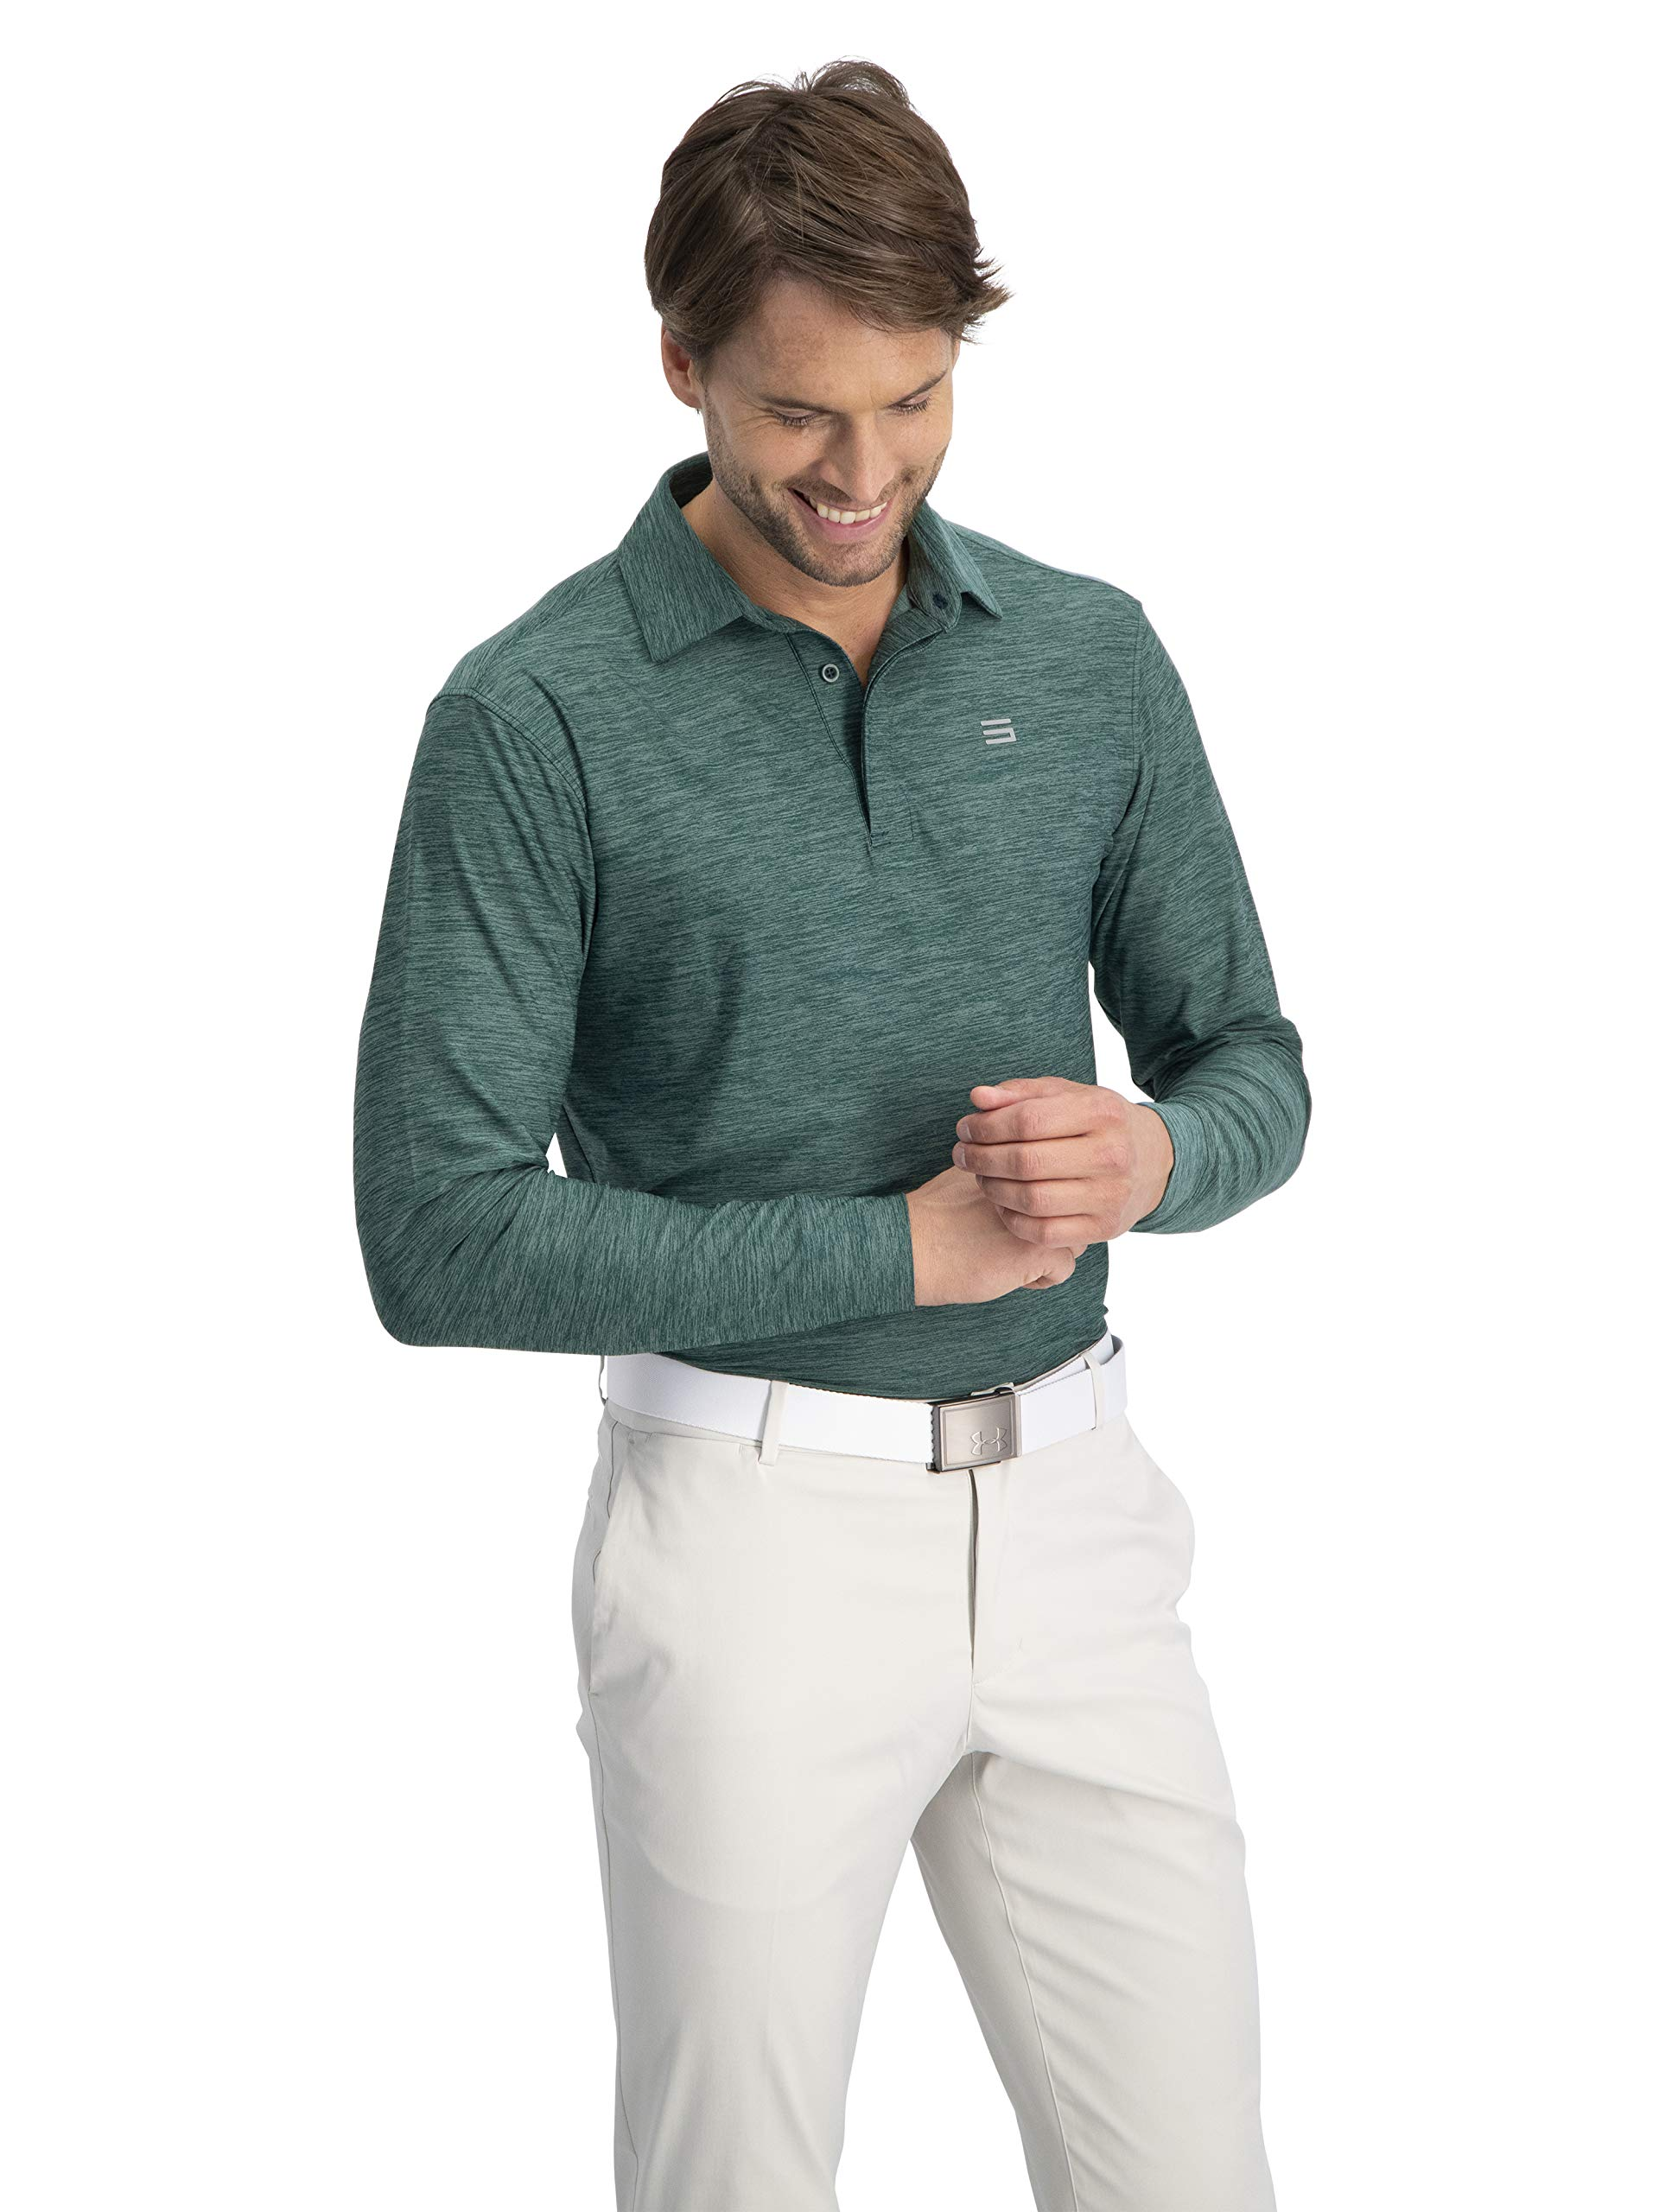 Jolt Gear Long Sleeve Polo Atlantic Green, M